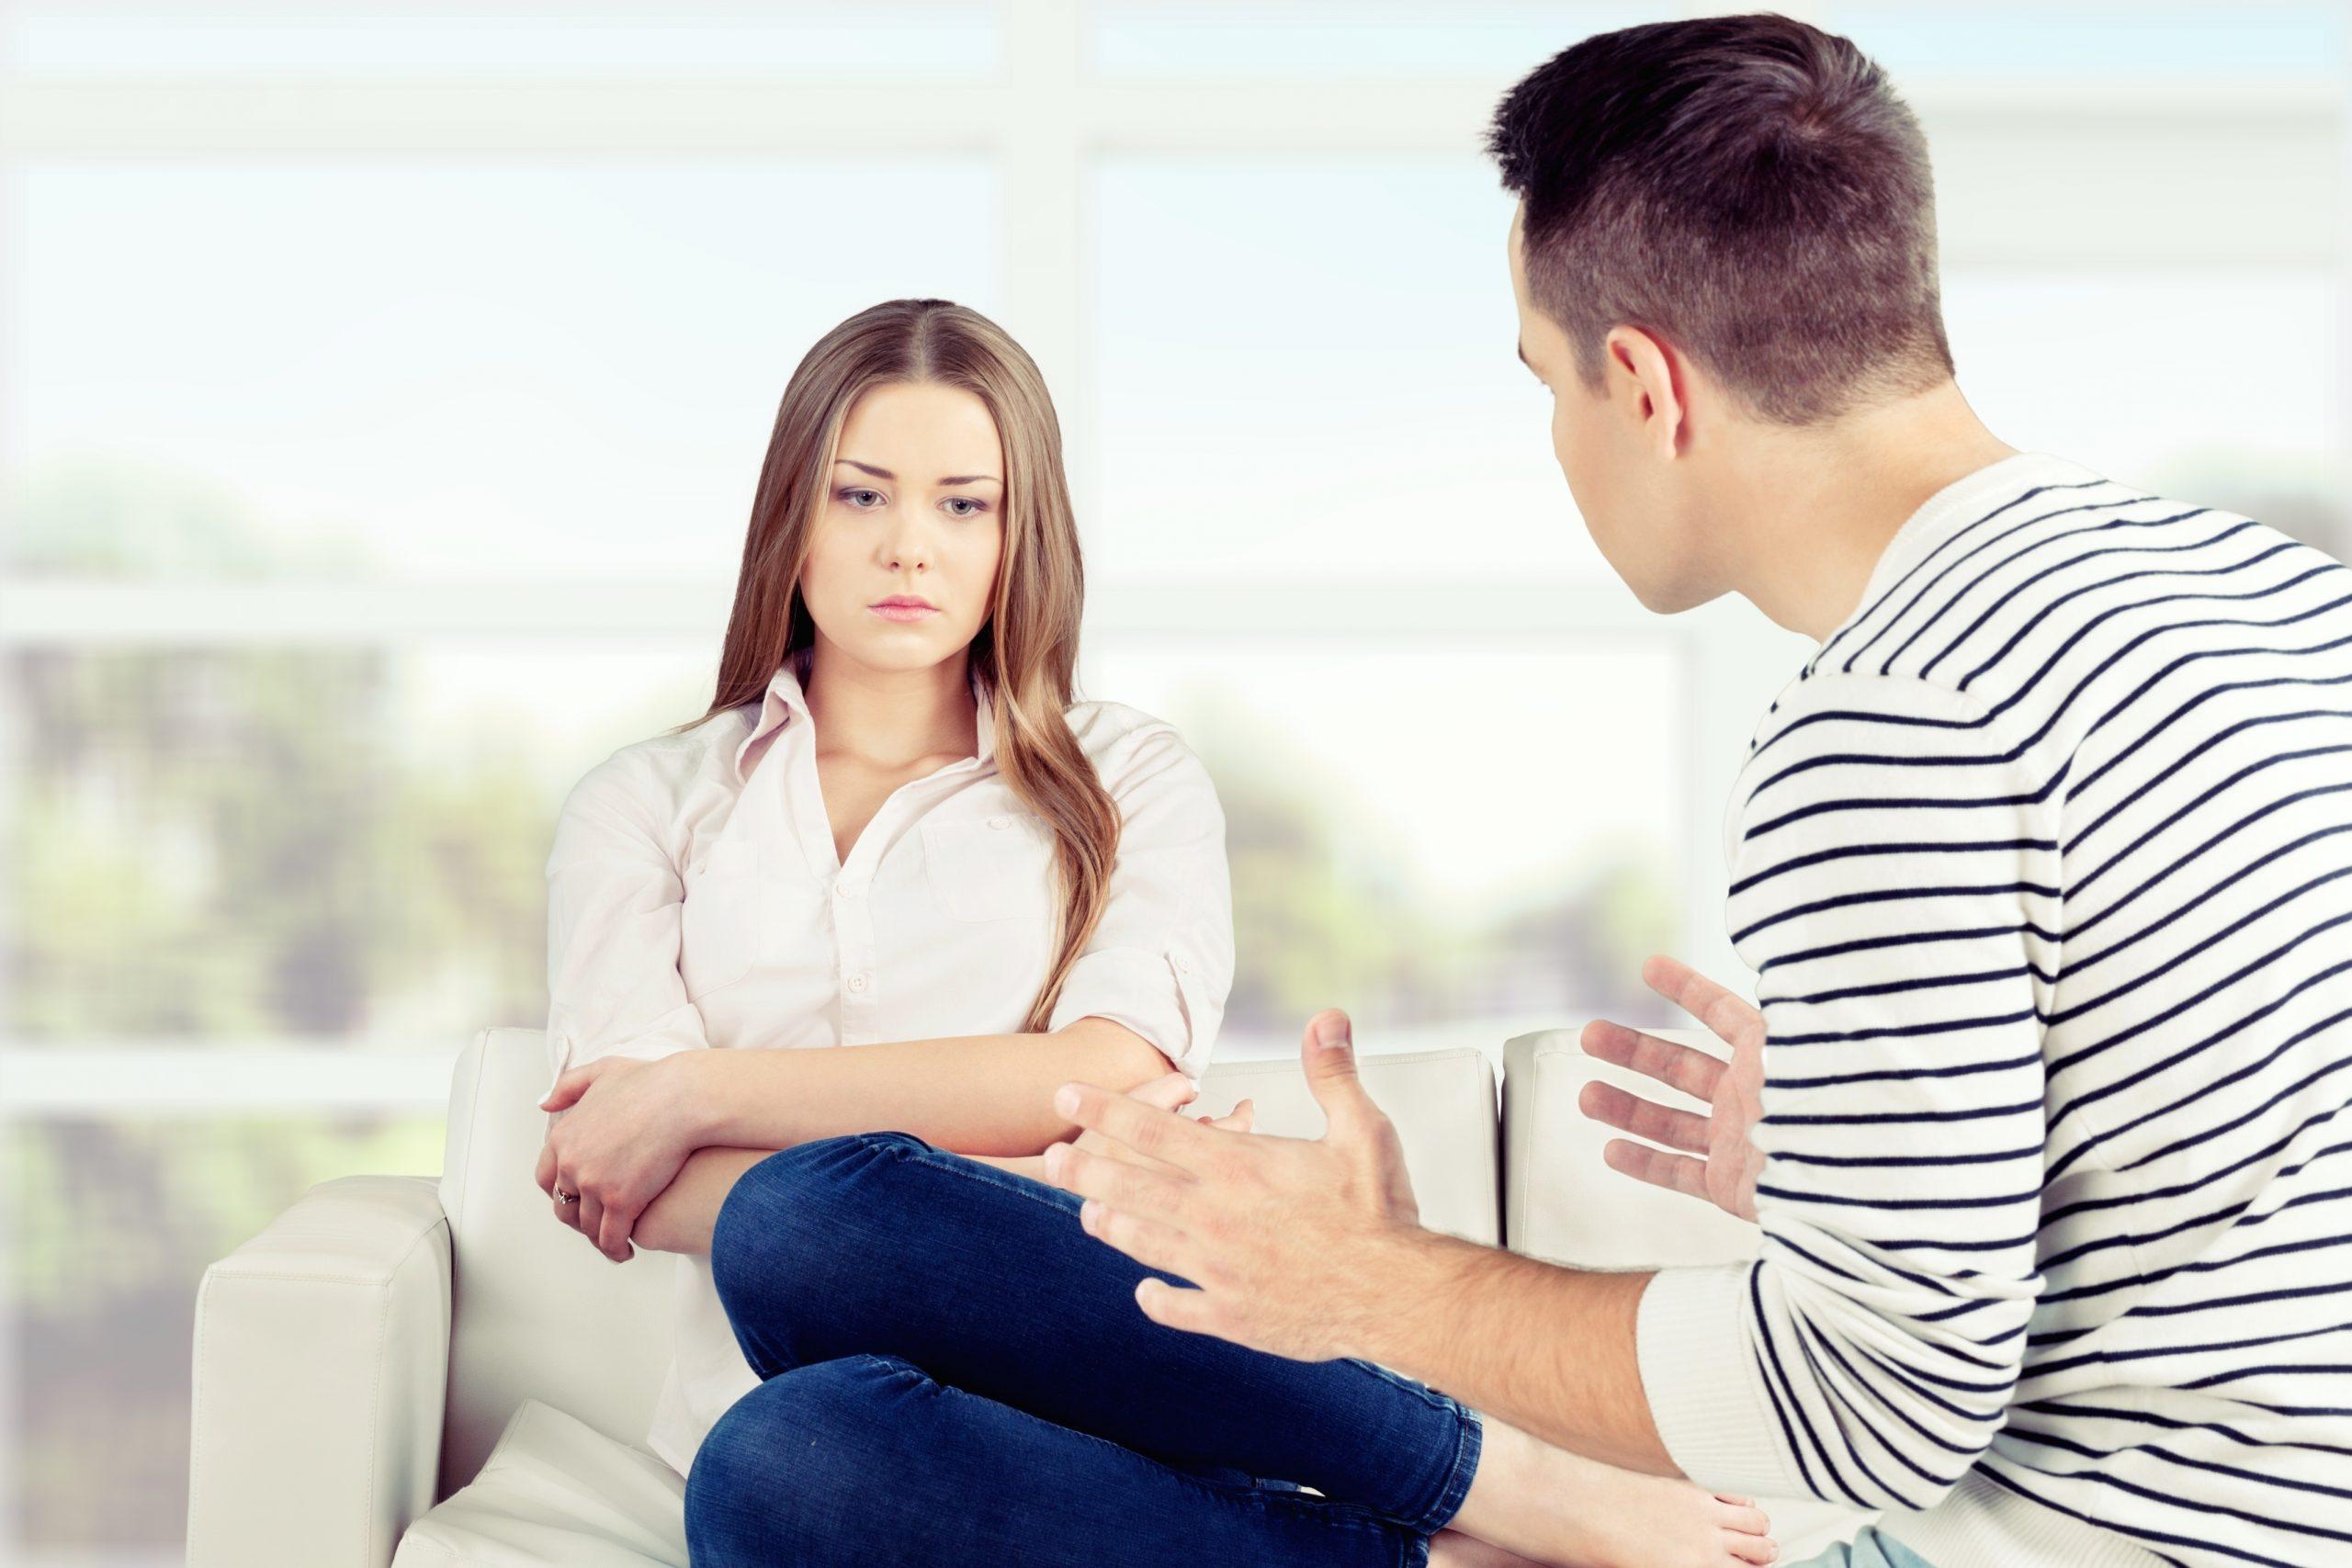 overcome Latin phone dating breakup